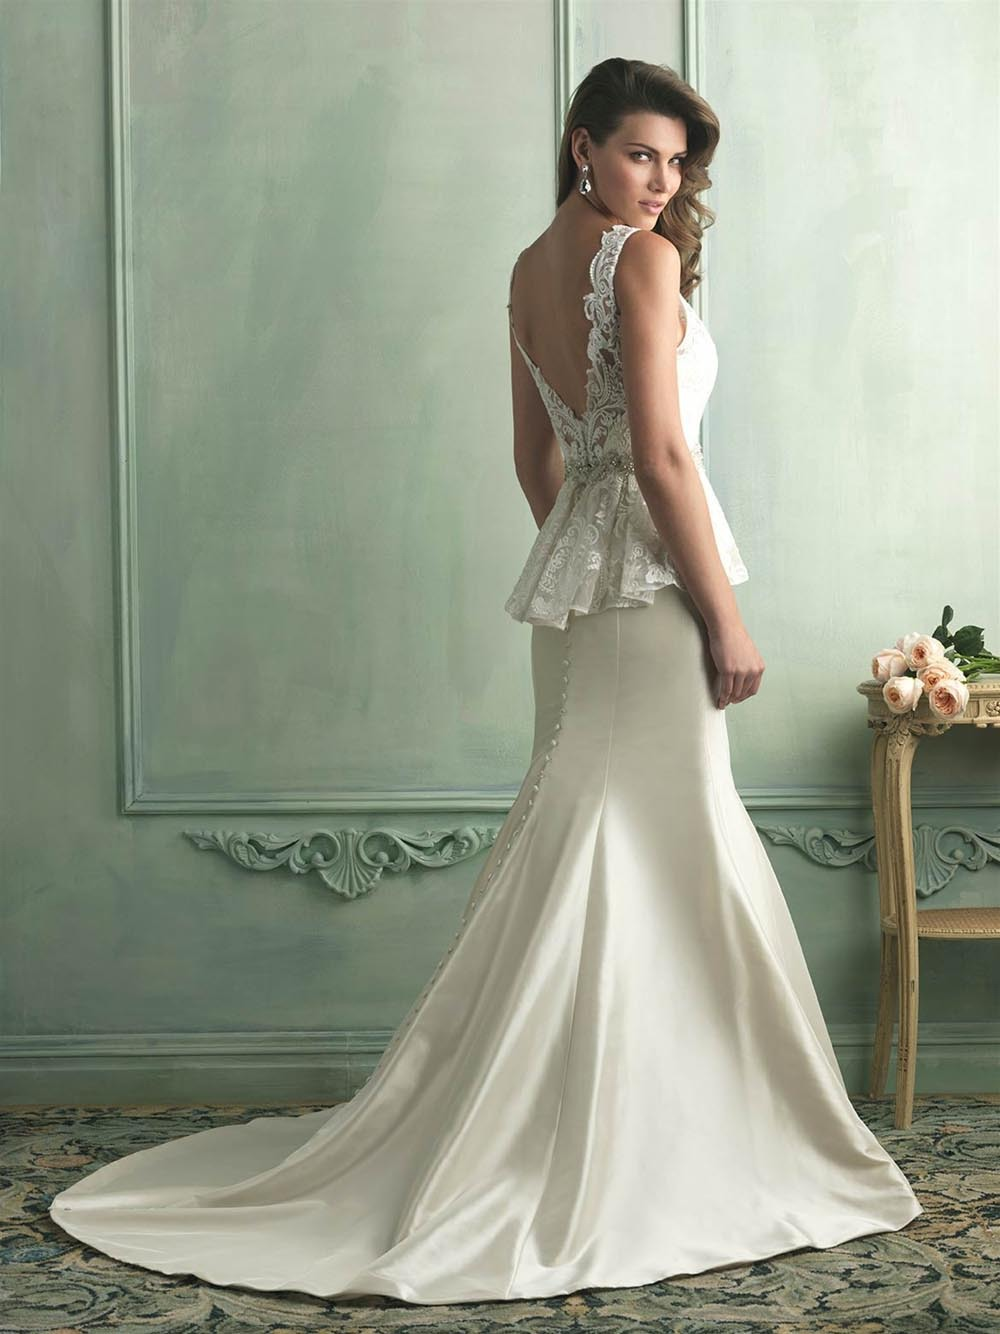 Aliexpress Buy Free Shipping We 2336 Bridal Mermaid Dress